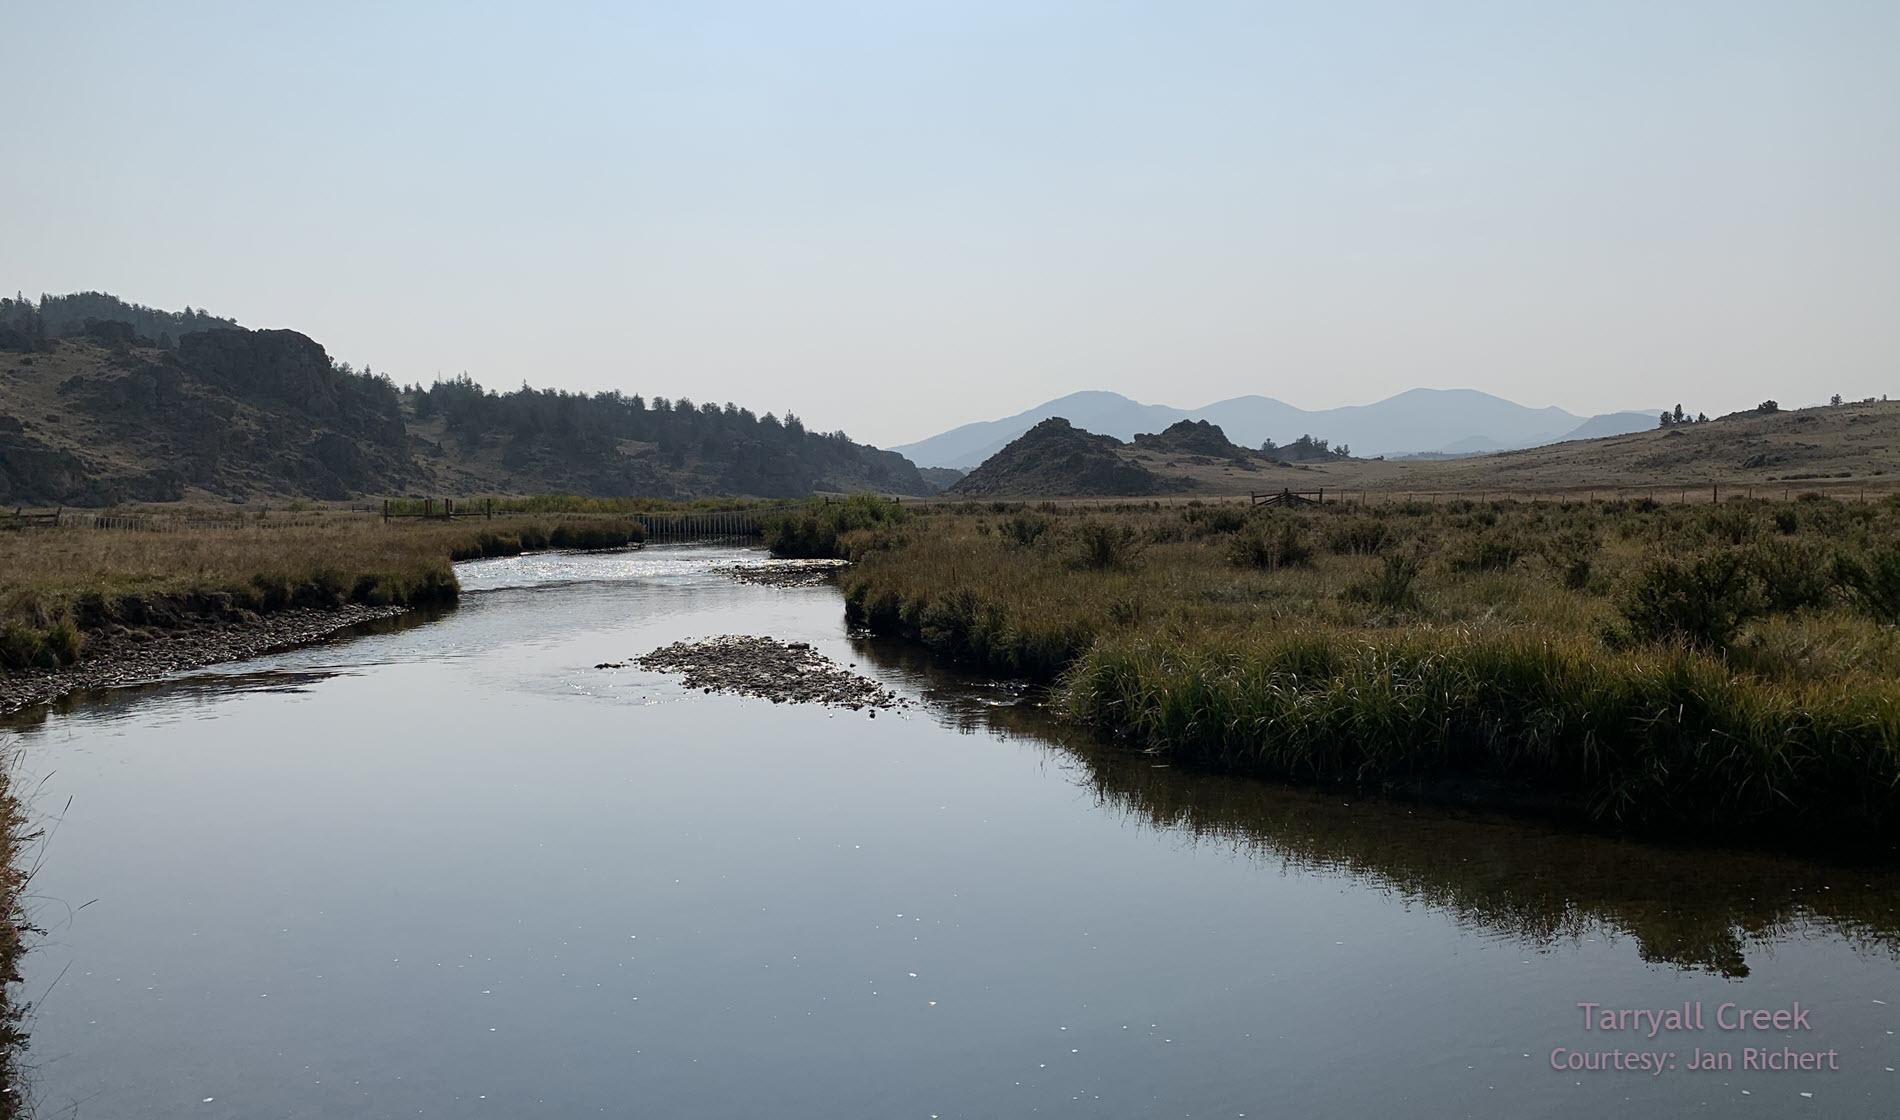 Tarryall_Creek.jpg